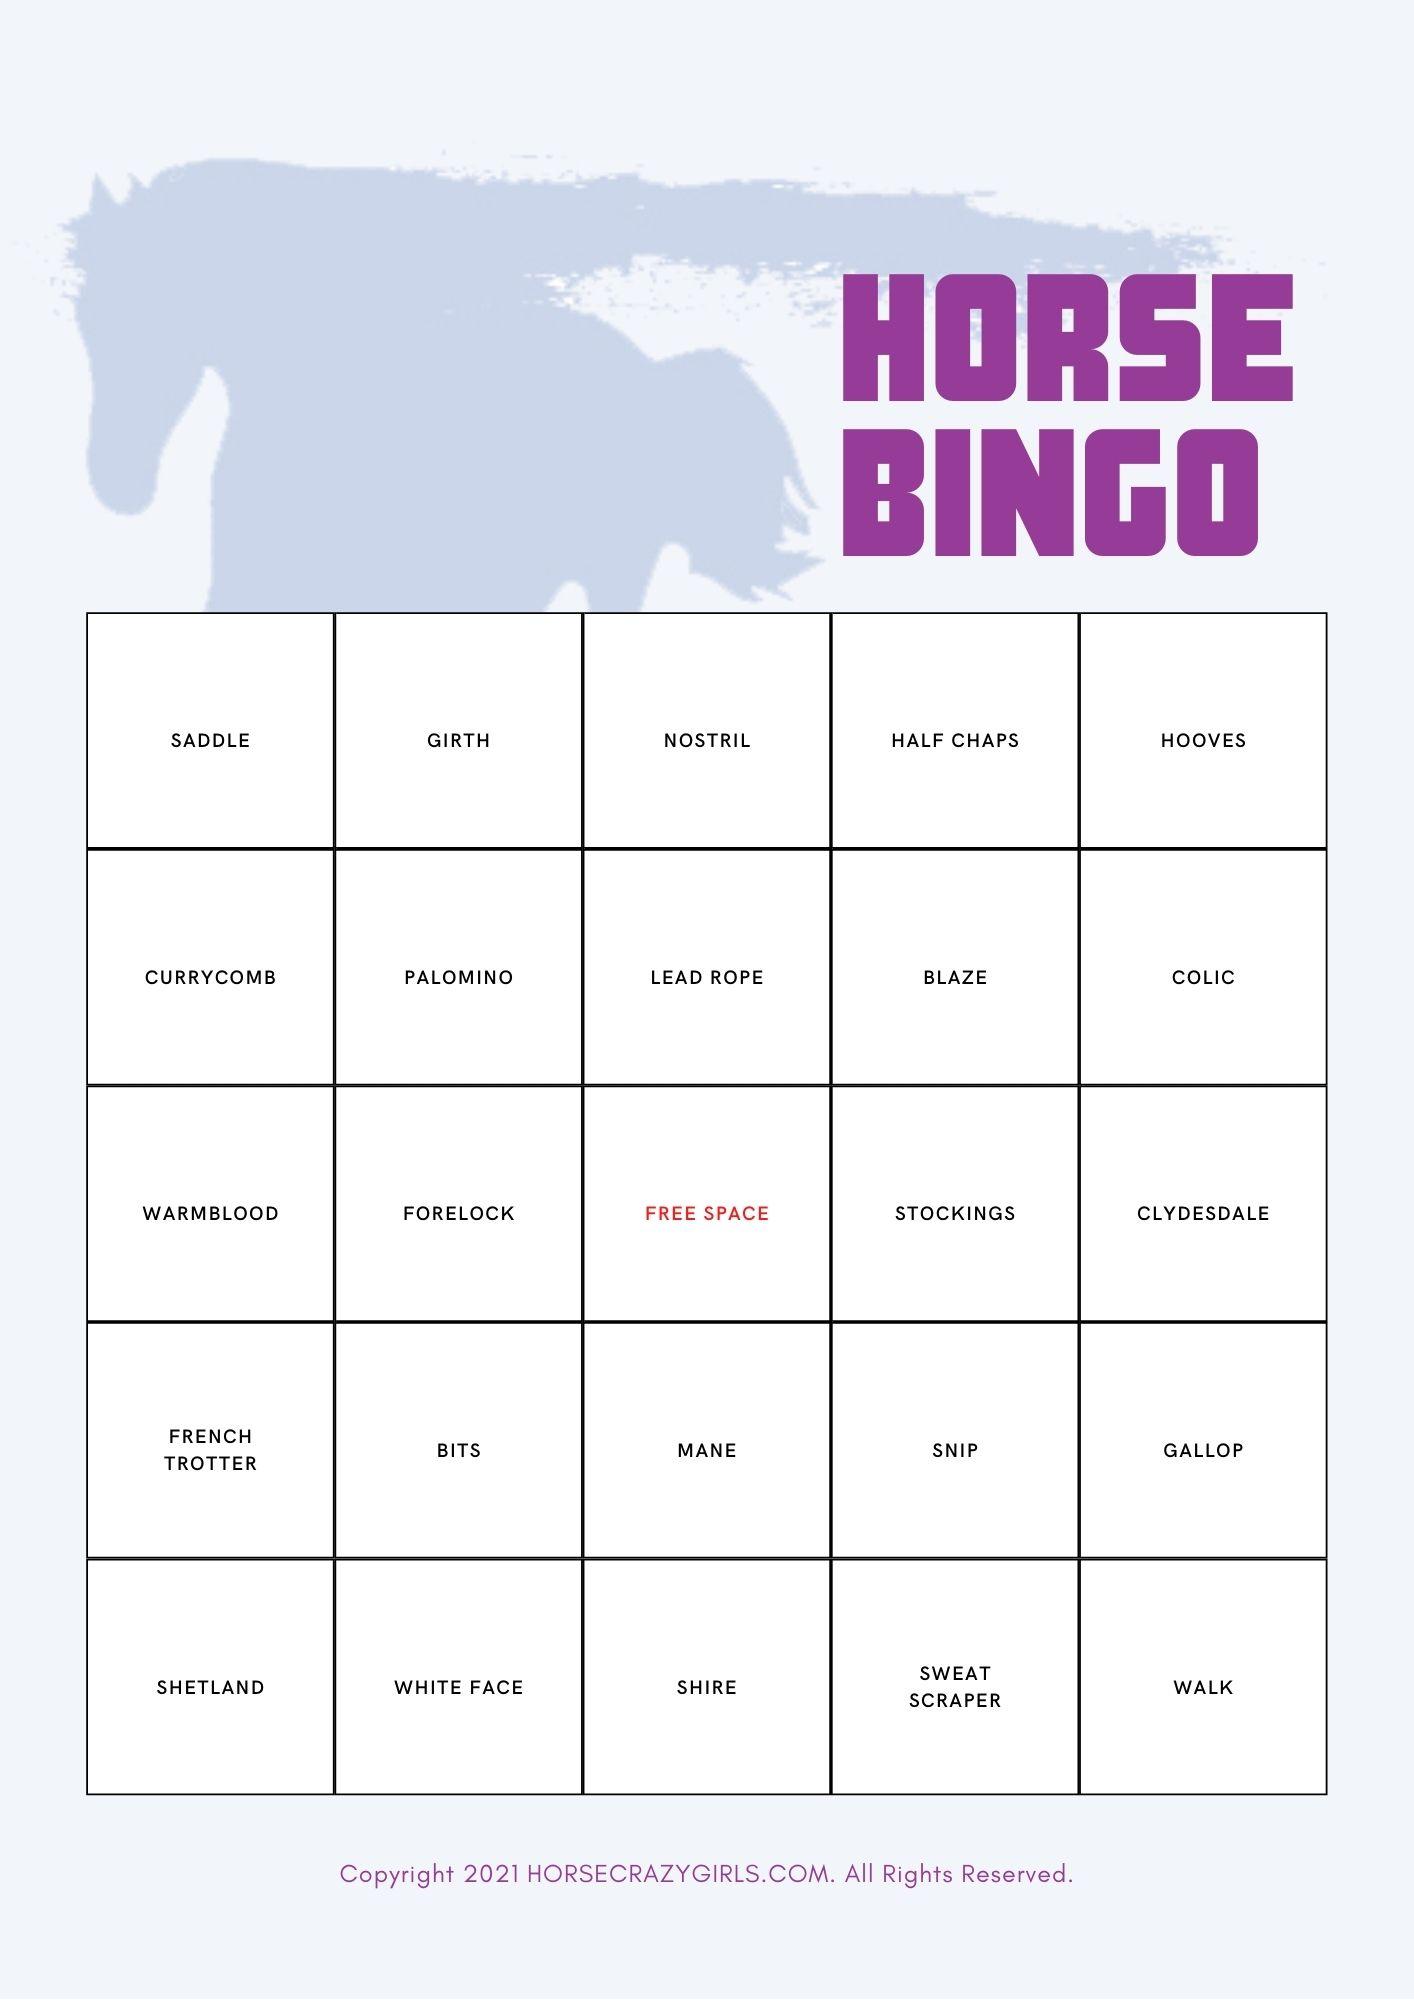 A bingo card with a horse theme.